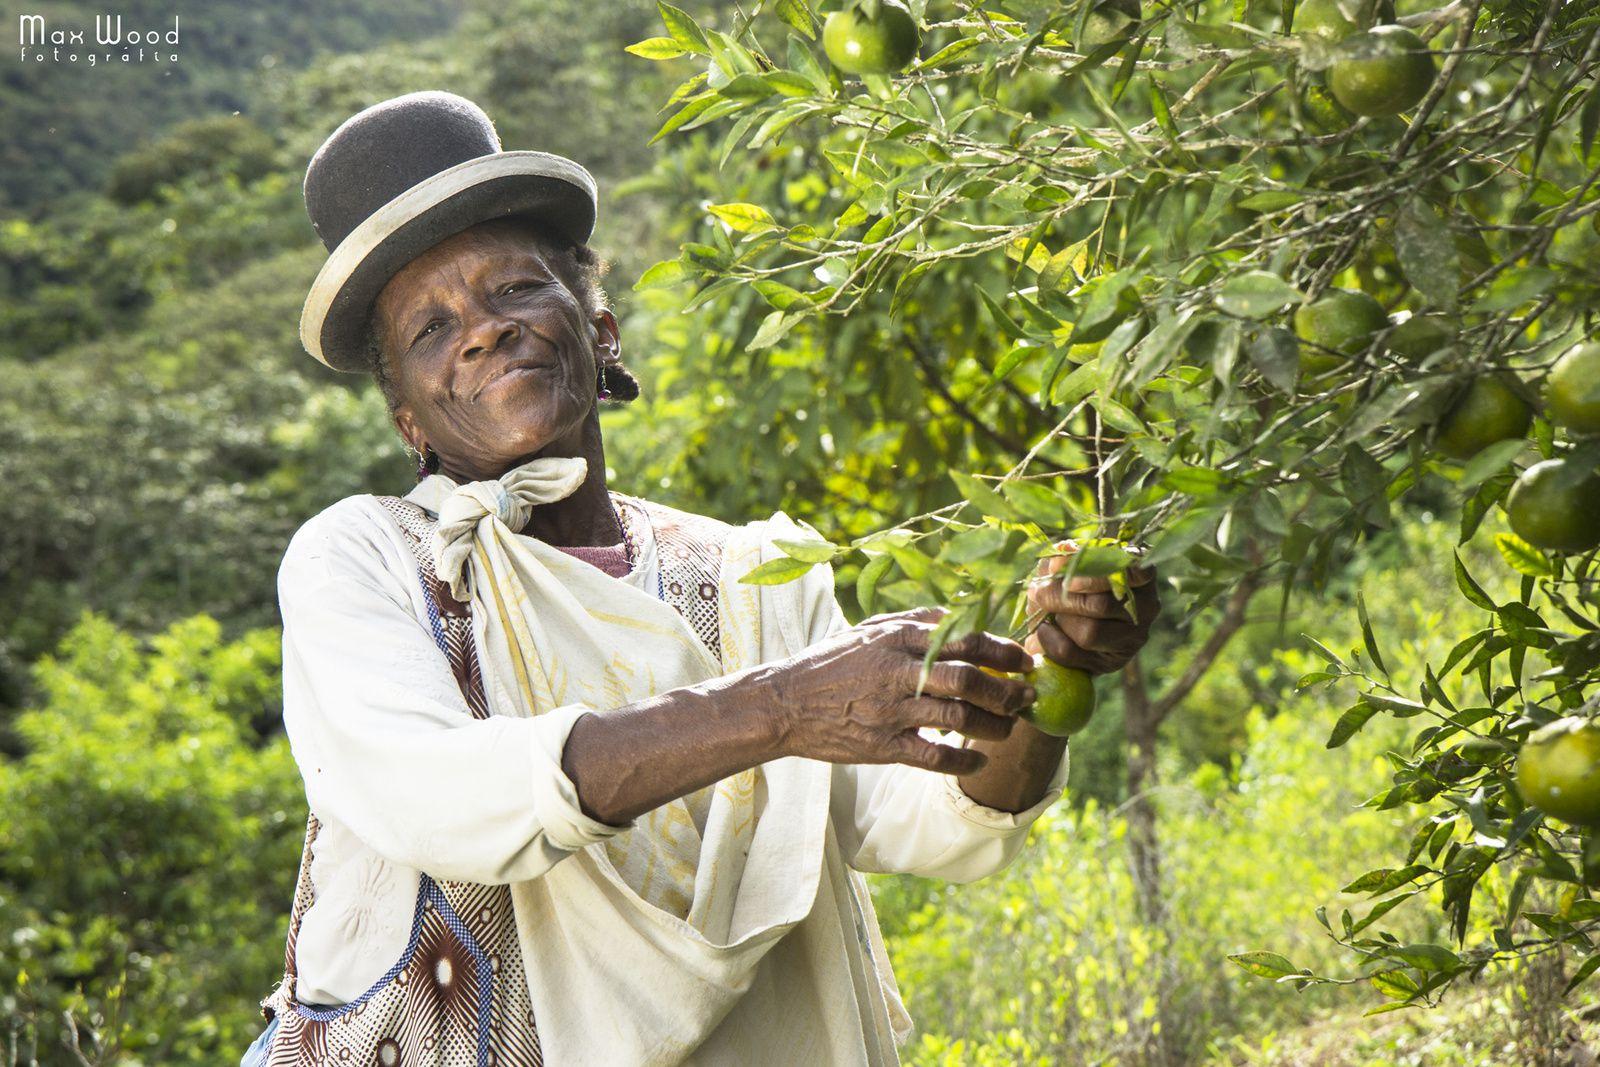 COCA FARMERS, AFRO-BOLIVIAN CULTURE - Chijchipa - Yungas region - Bolivia